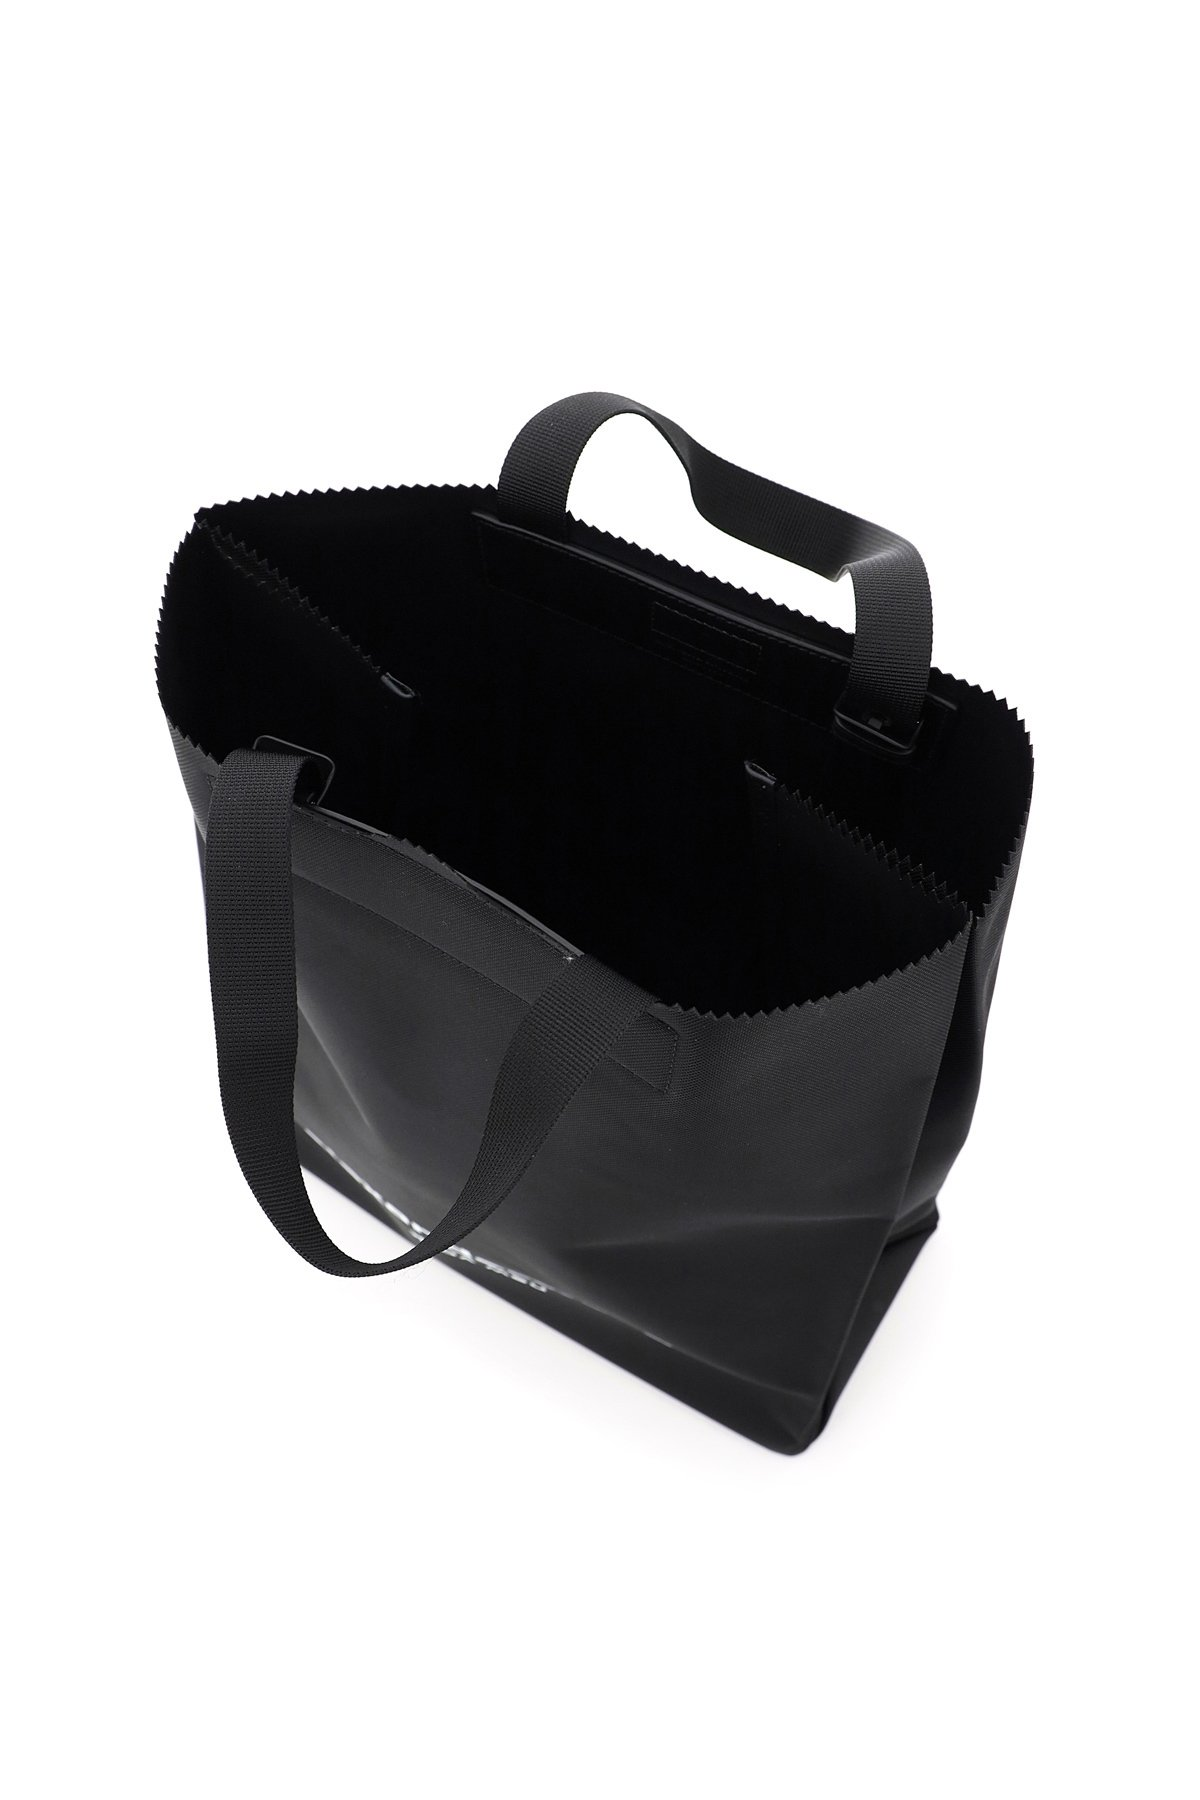 Alexander wang shopping lunch bag